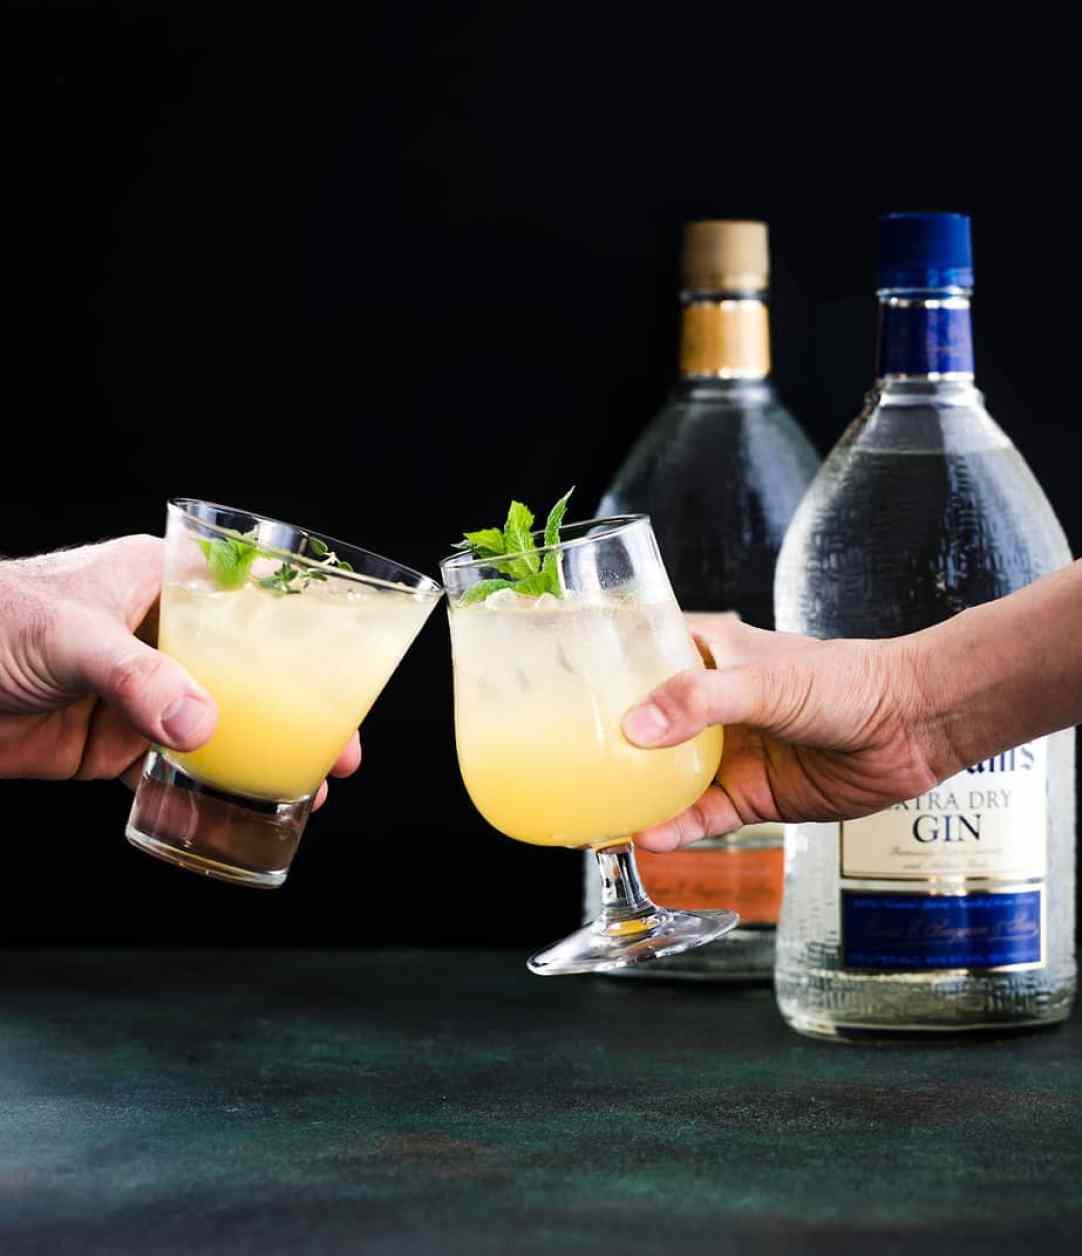 orange gin recipe cocktail seagrams